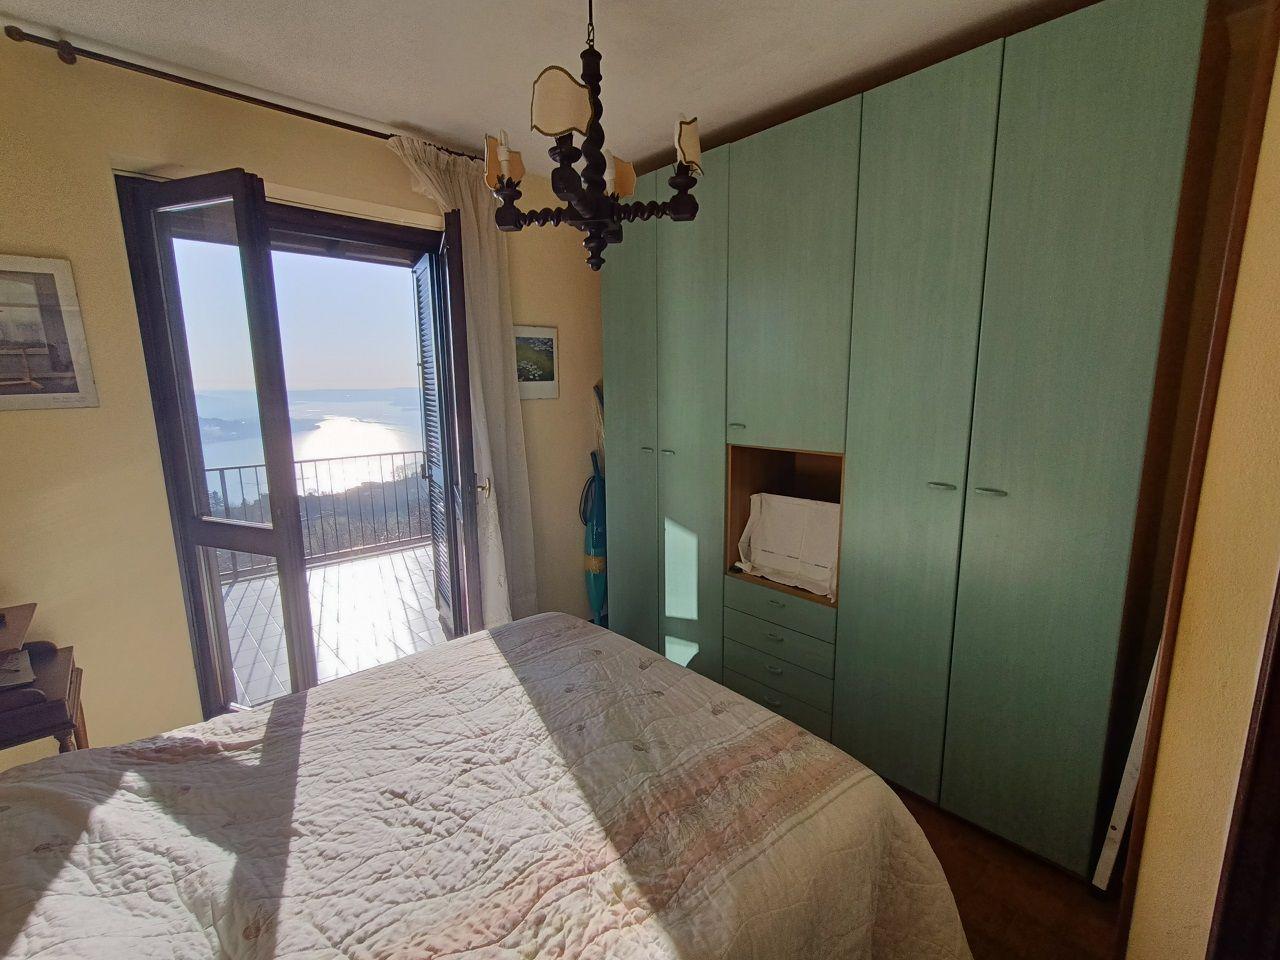 Villetta indipendente vista lago e giardino